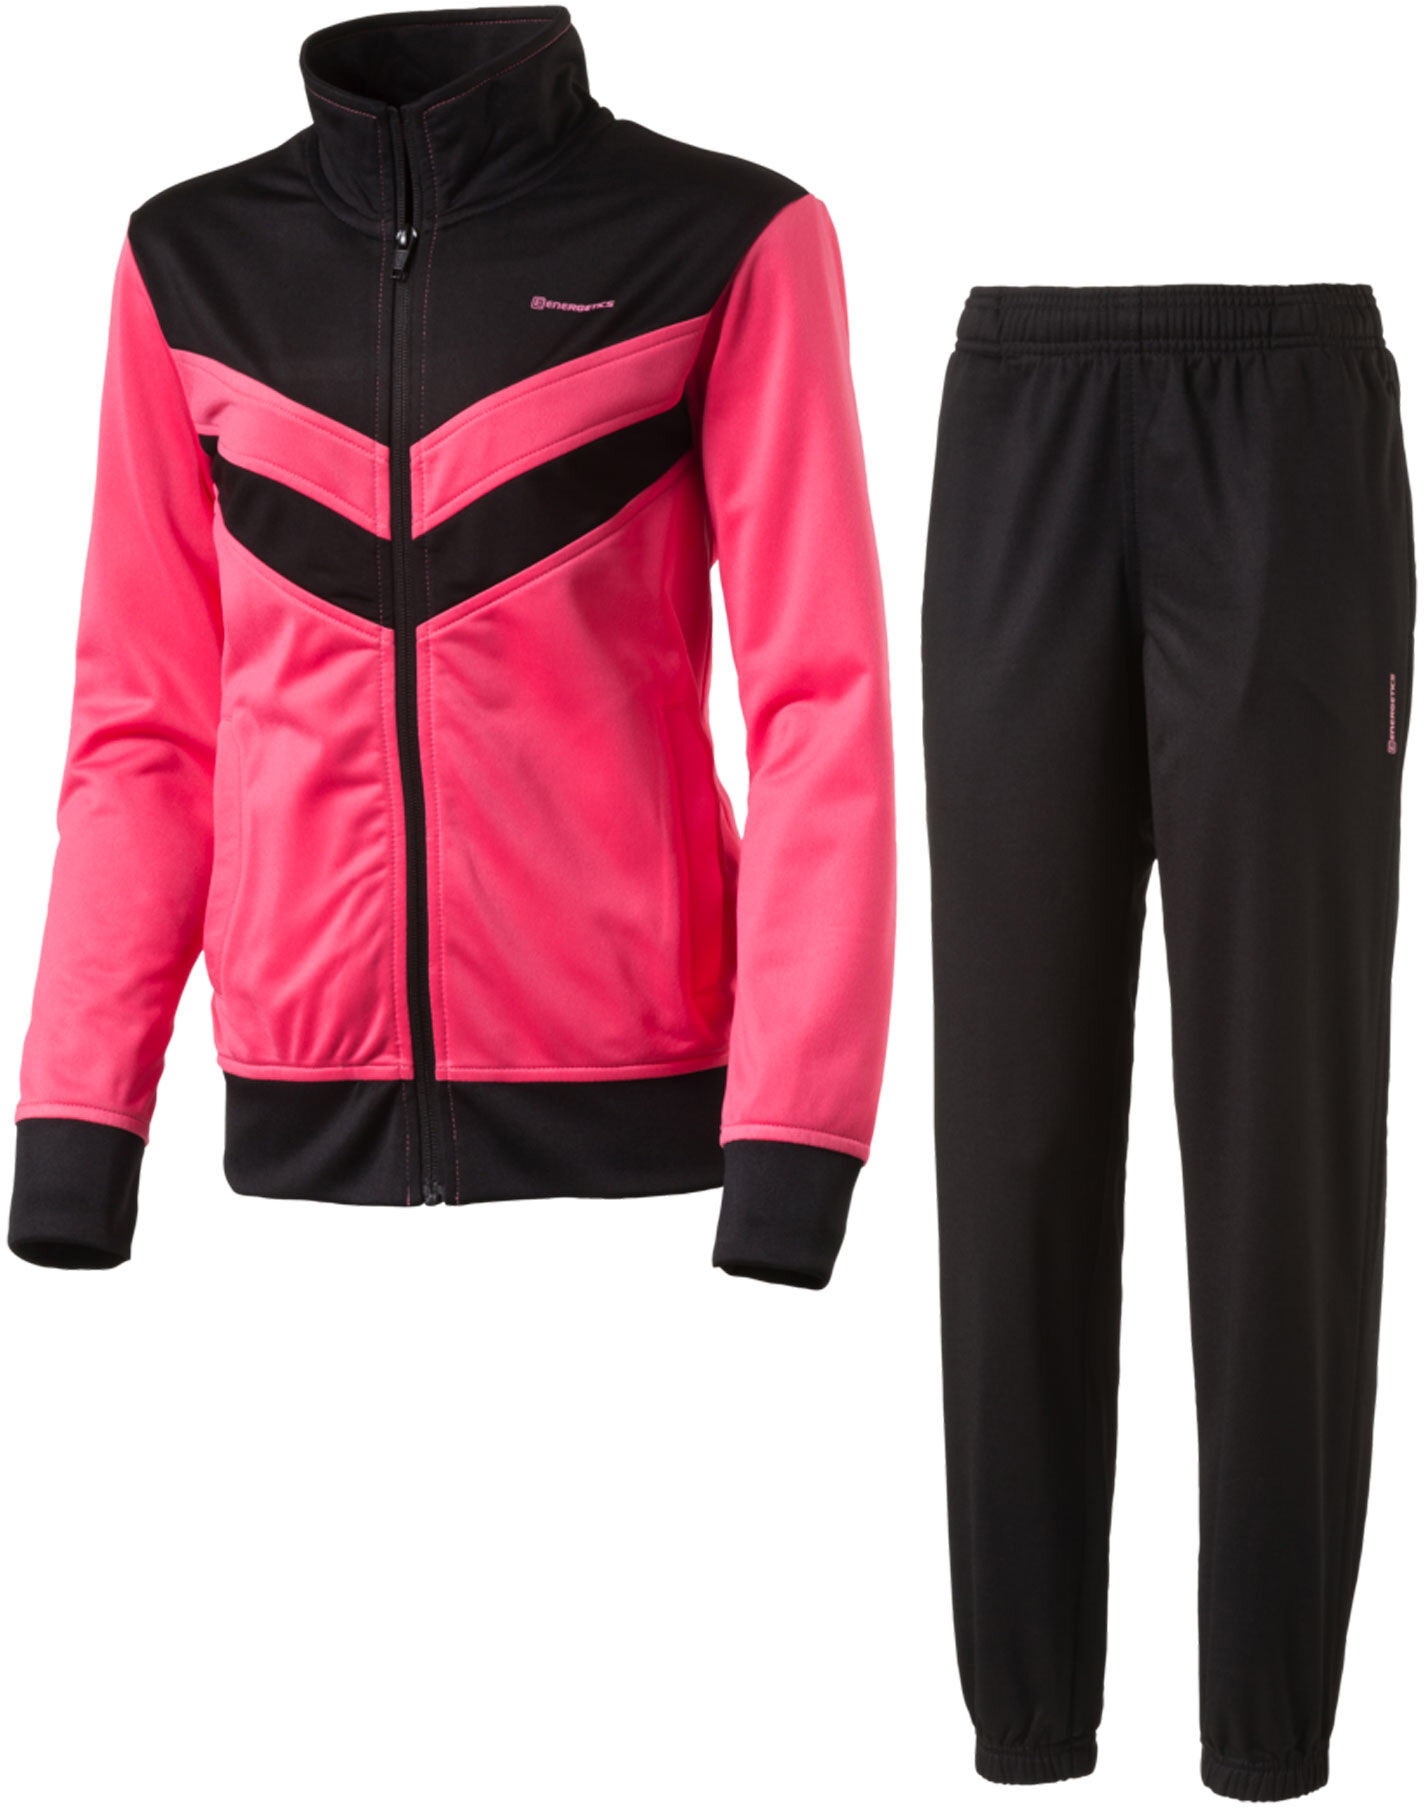 ADIDAS TS ENTRY SUIT Herr Trainingsanzug Fitness Sport Jacke